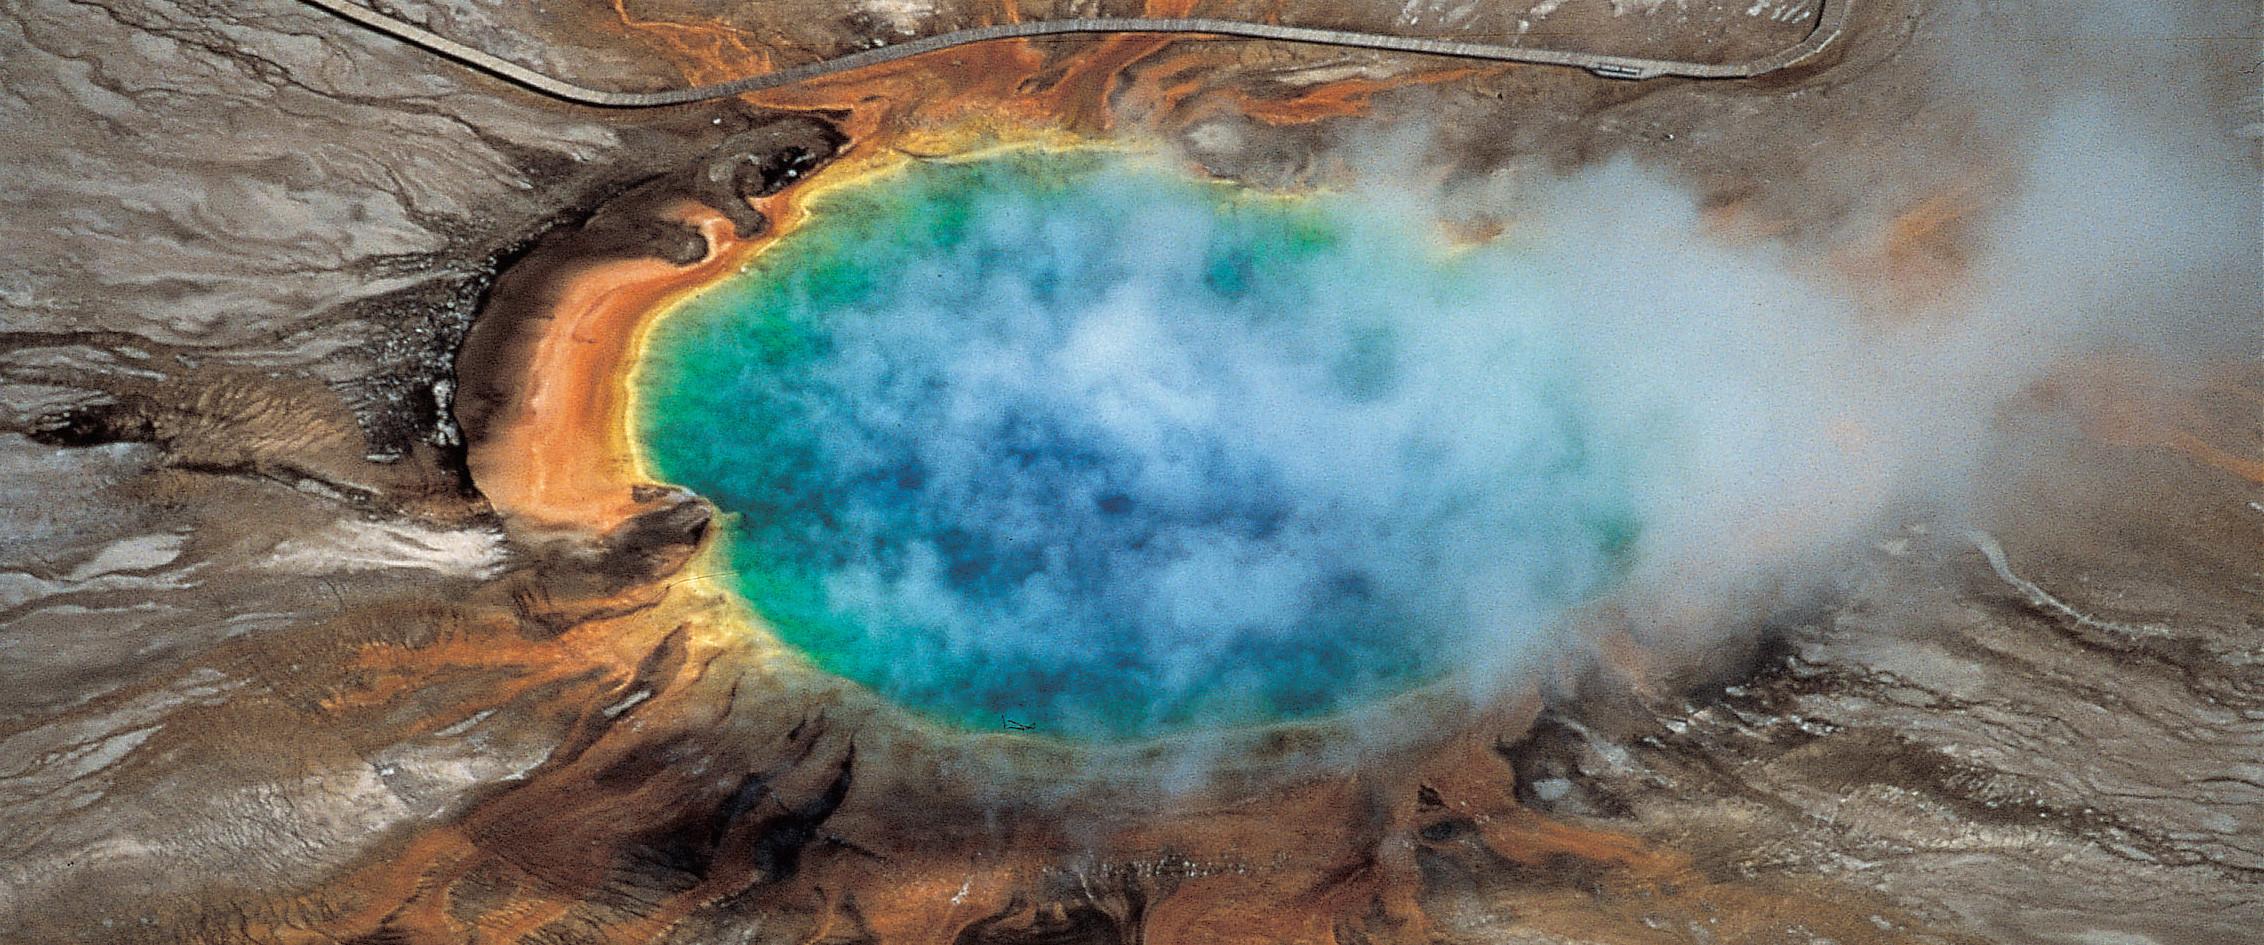 El-supervolcan-de-Yellowstone-alberga-otra-reserva-de-magma-aun-mas-grande